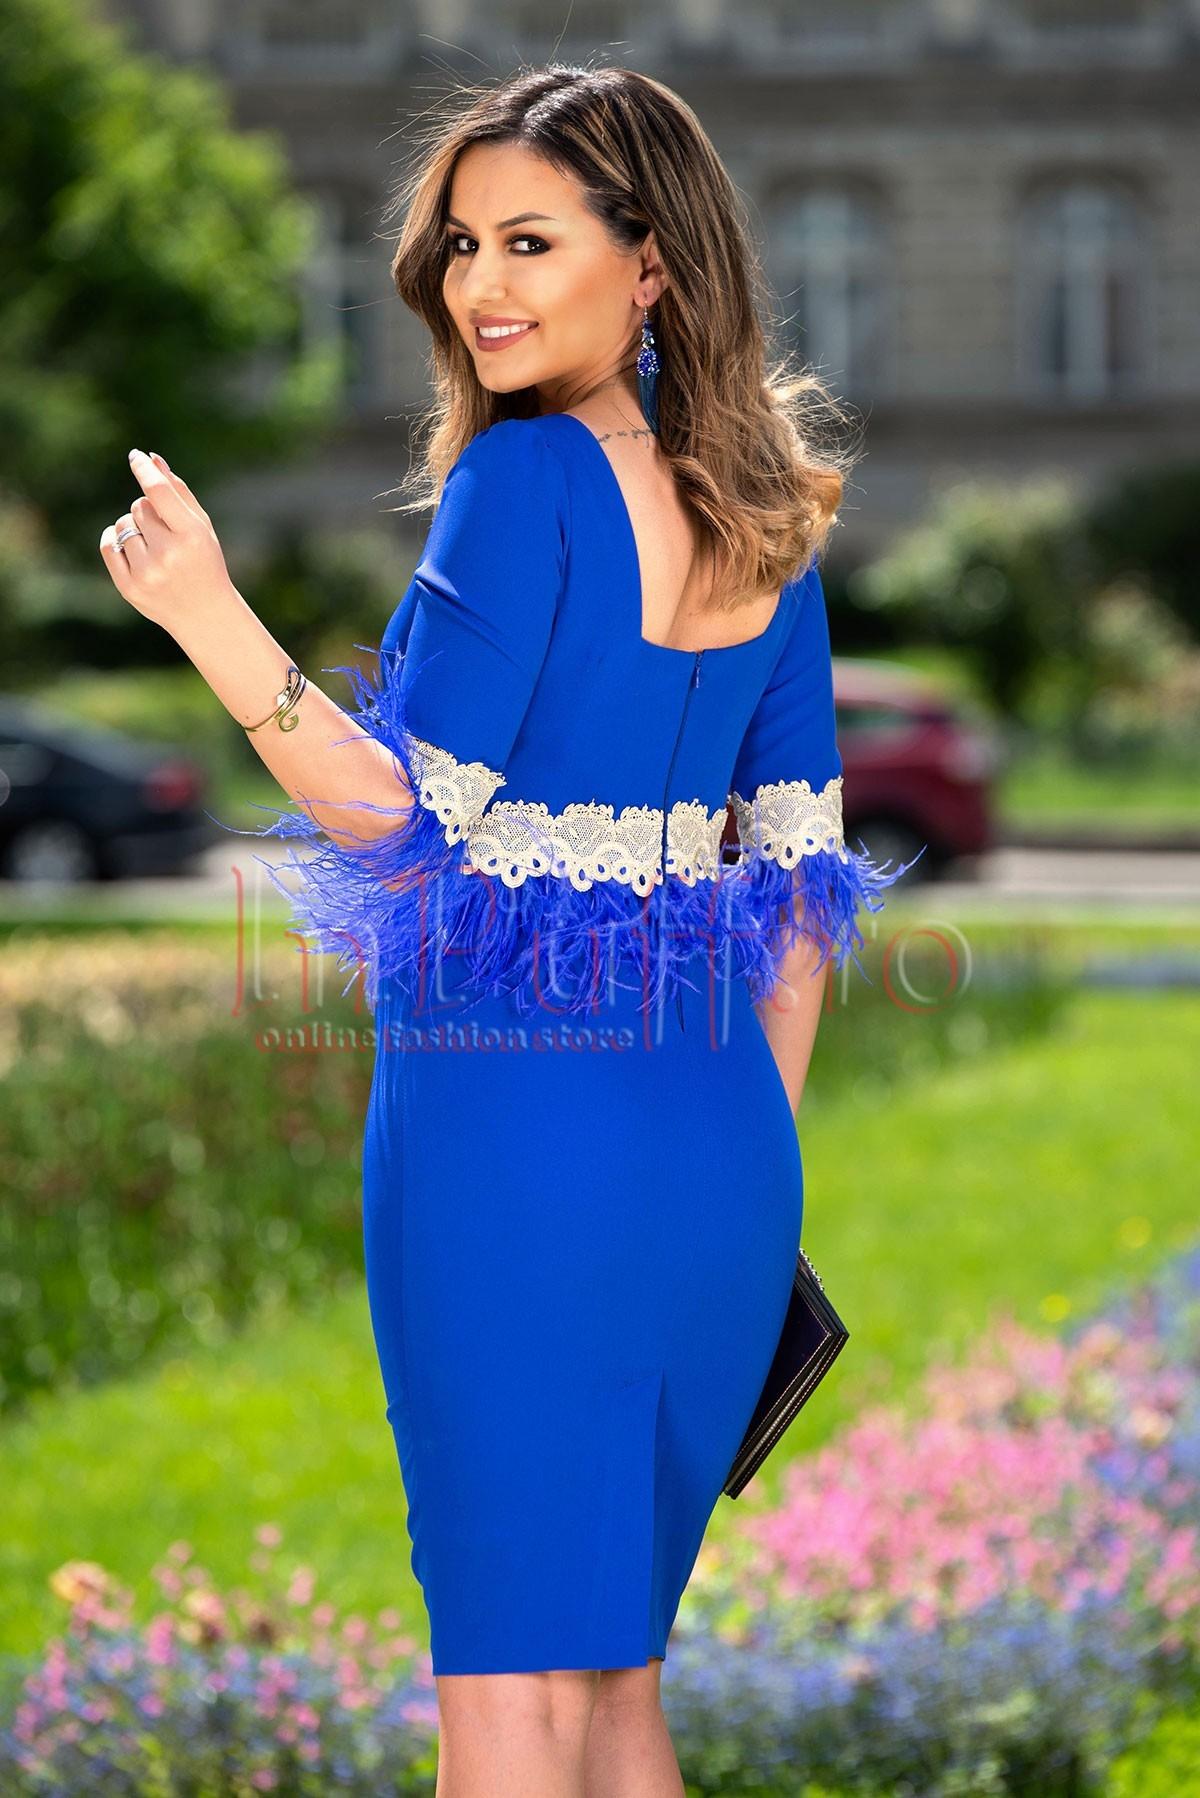 Rochie midi de ocazie albastra cu pene si broderie aurie